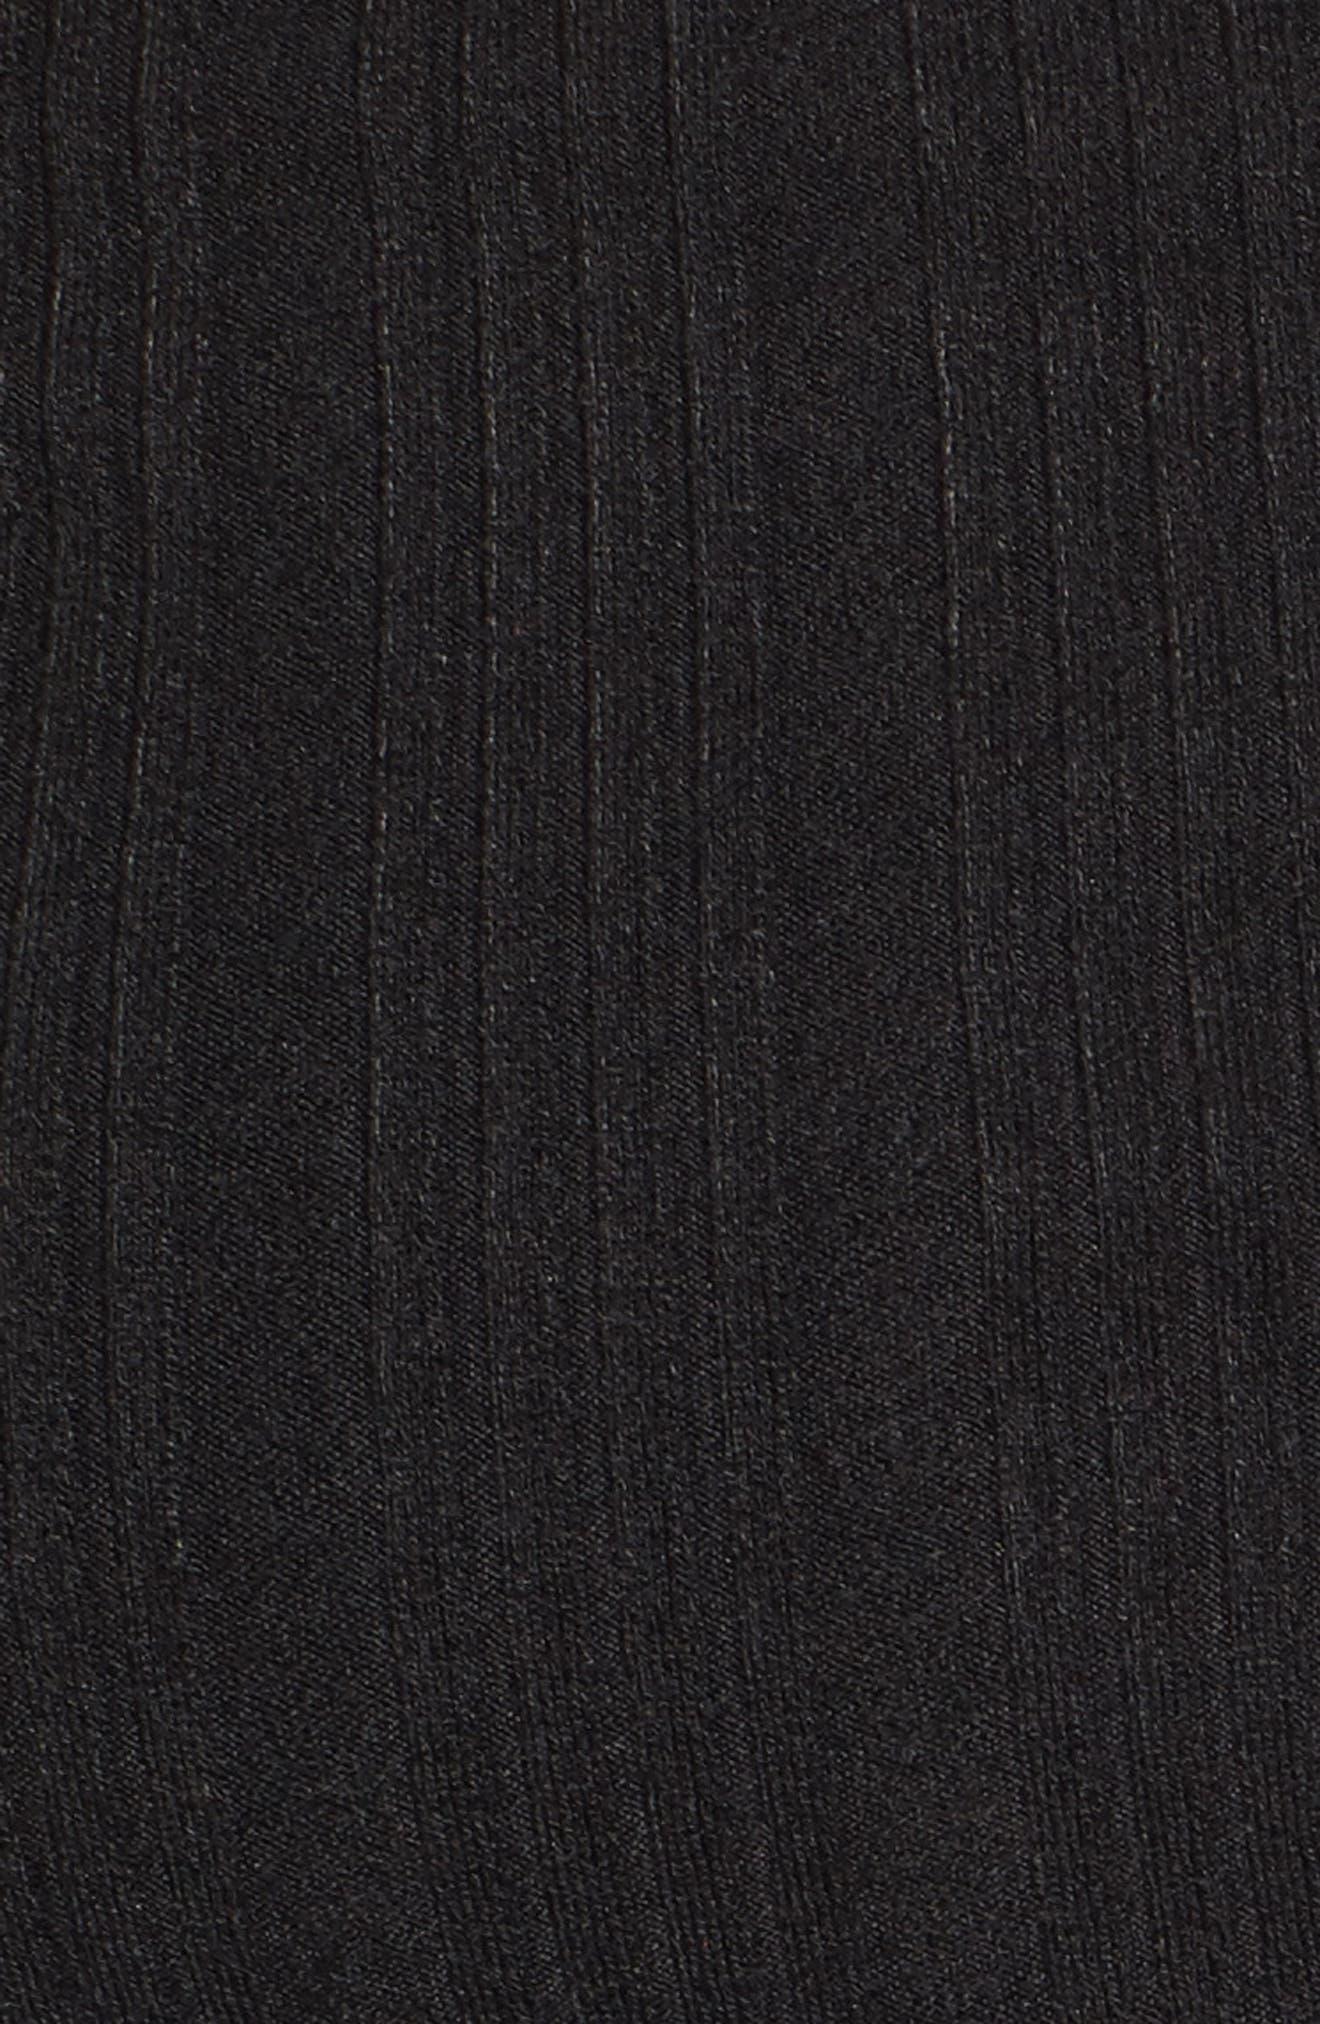 Lenda Off the Shoulder Crop Top,                             Alternate thumbnail 5, color,                             001